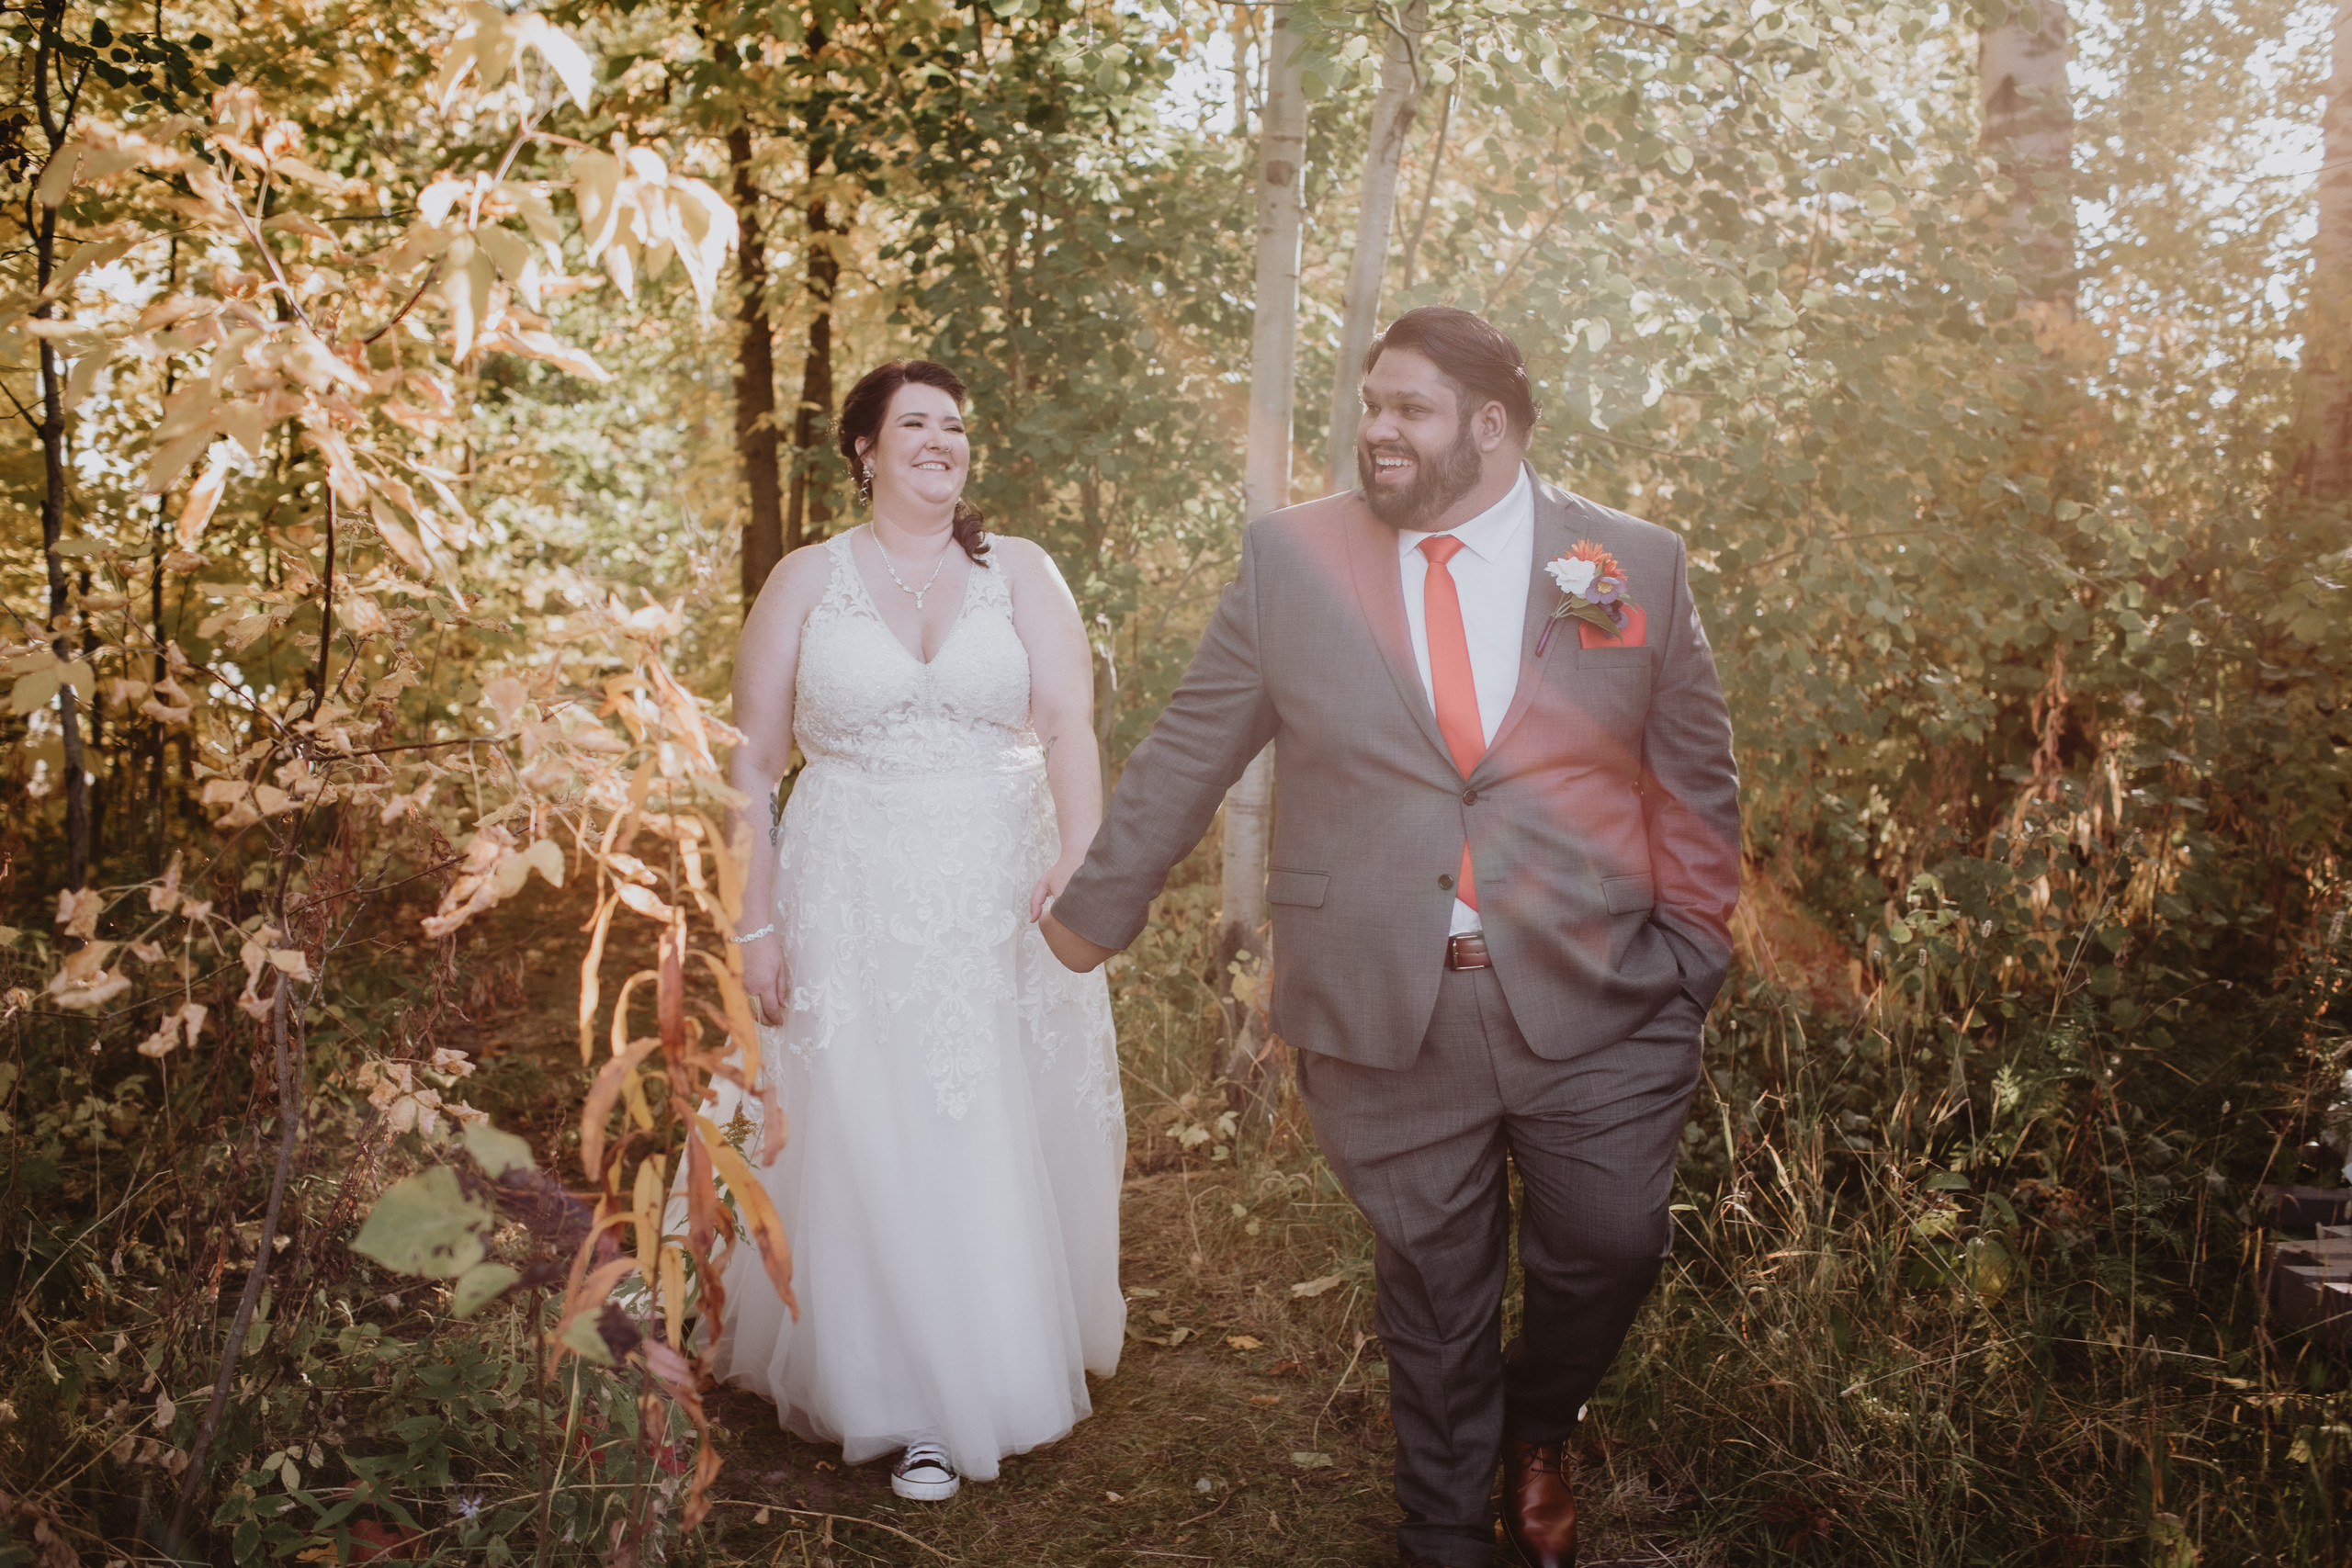 Wedding Couple Walks in Forest